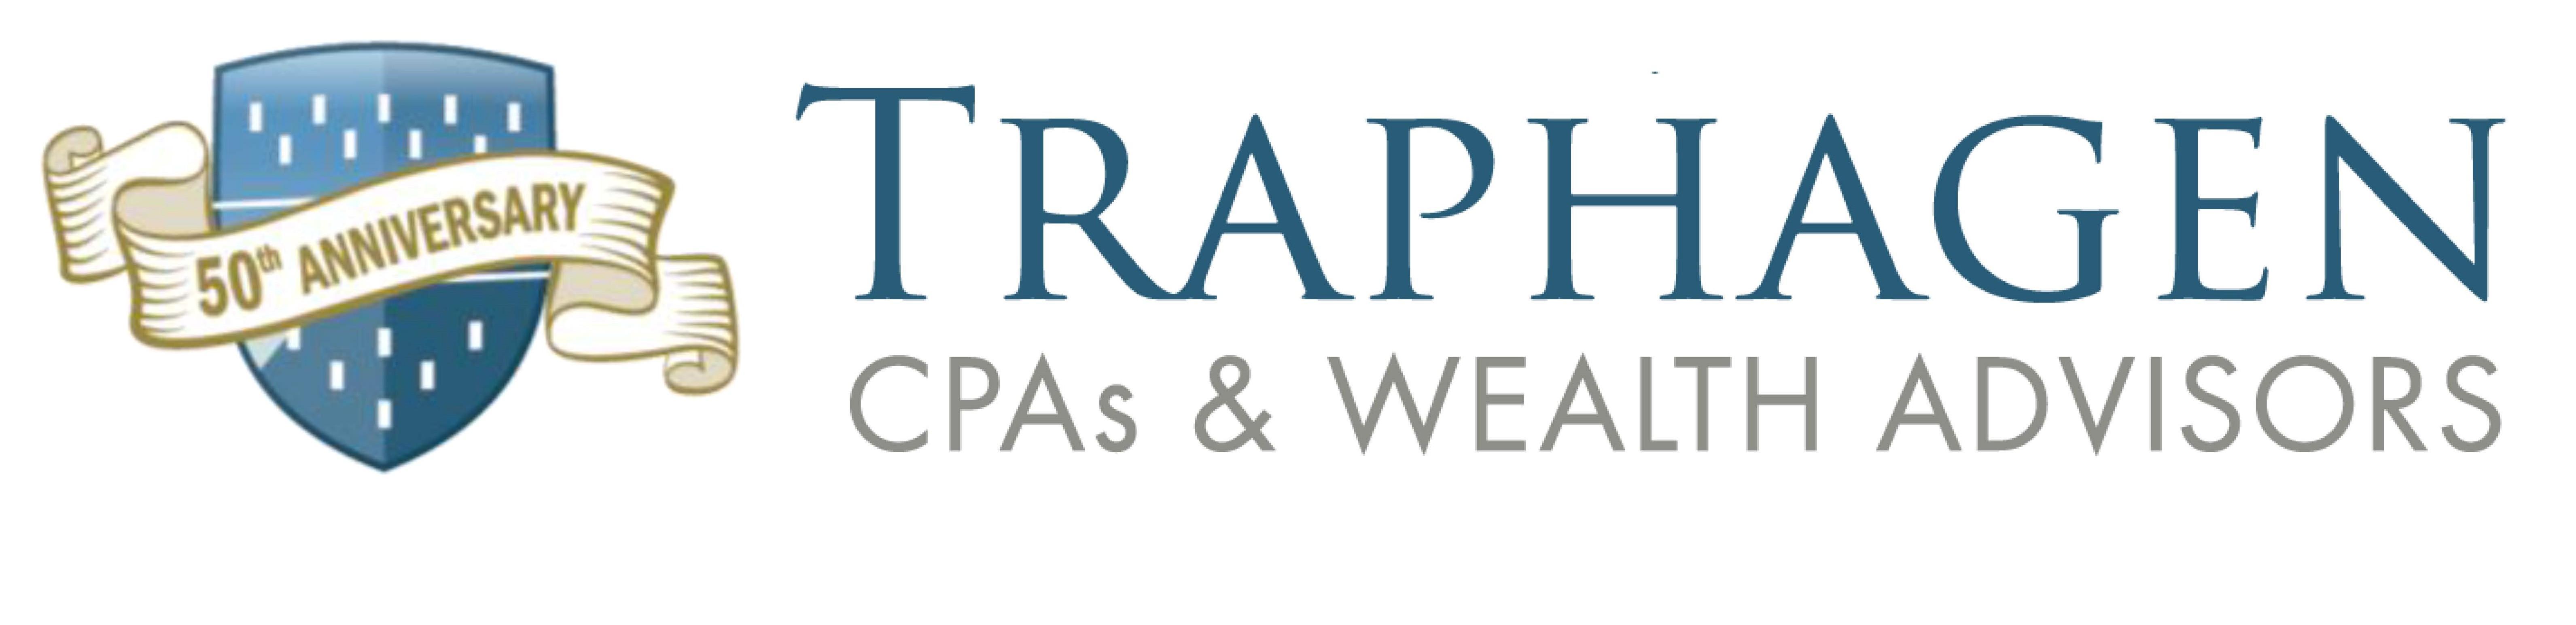 Traphagen Financial Group